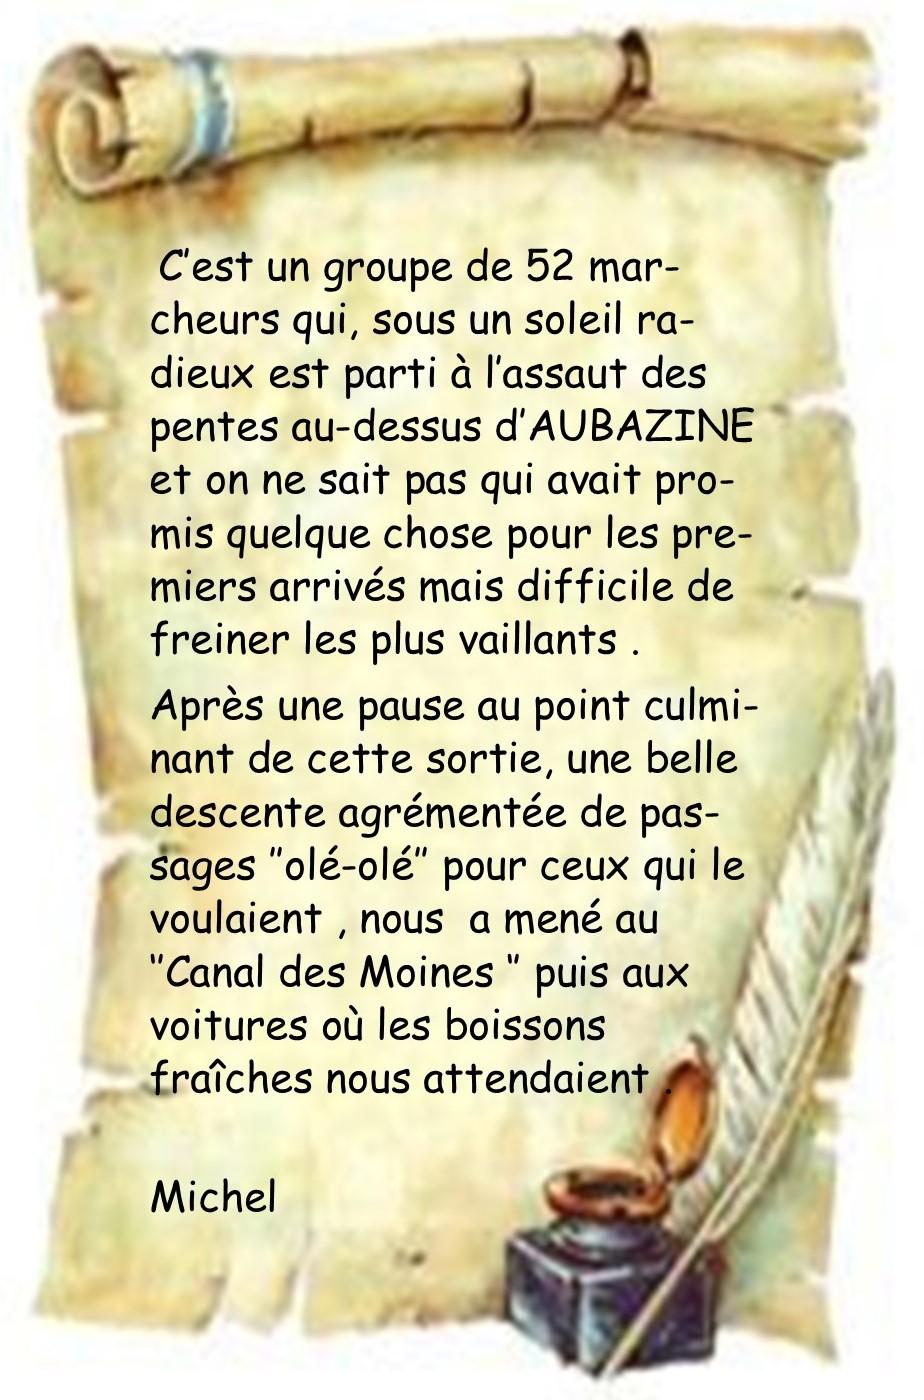 Article Aubazine 2